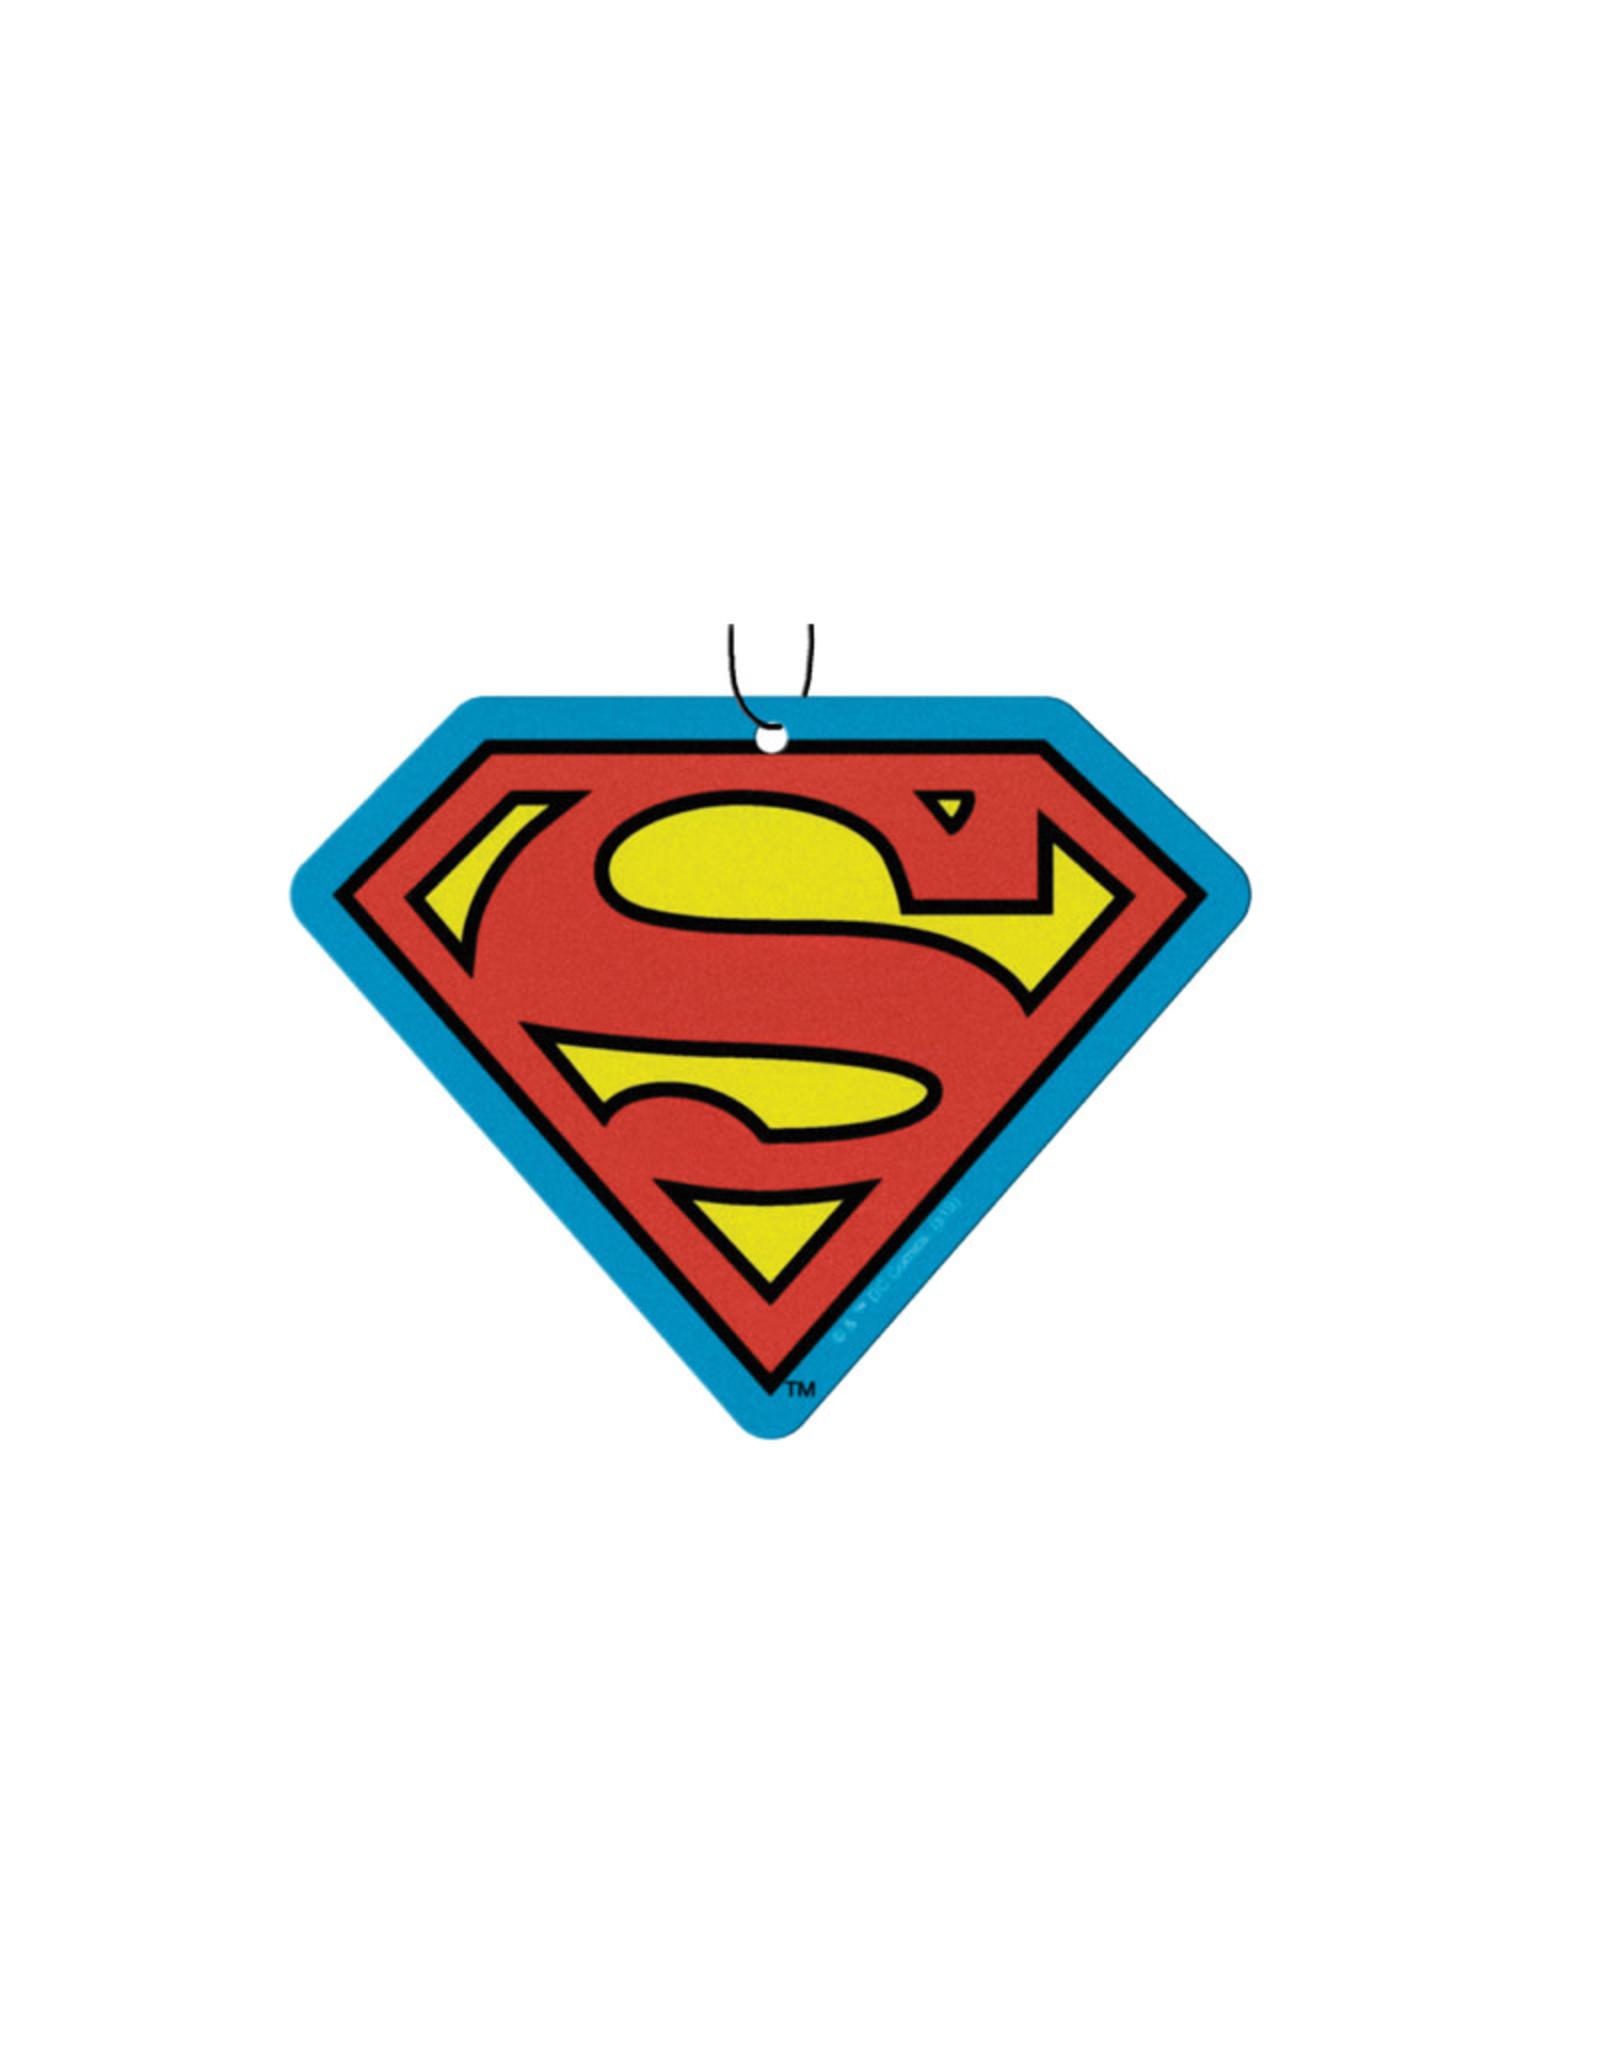 Dc comics Superman ( Air Fresheners )